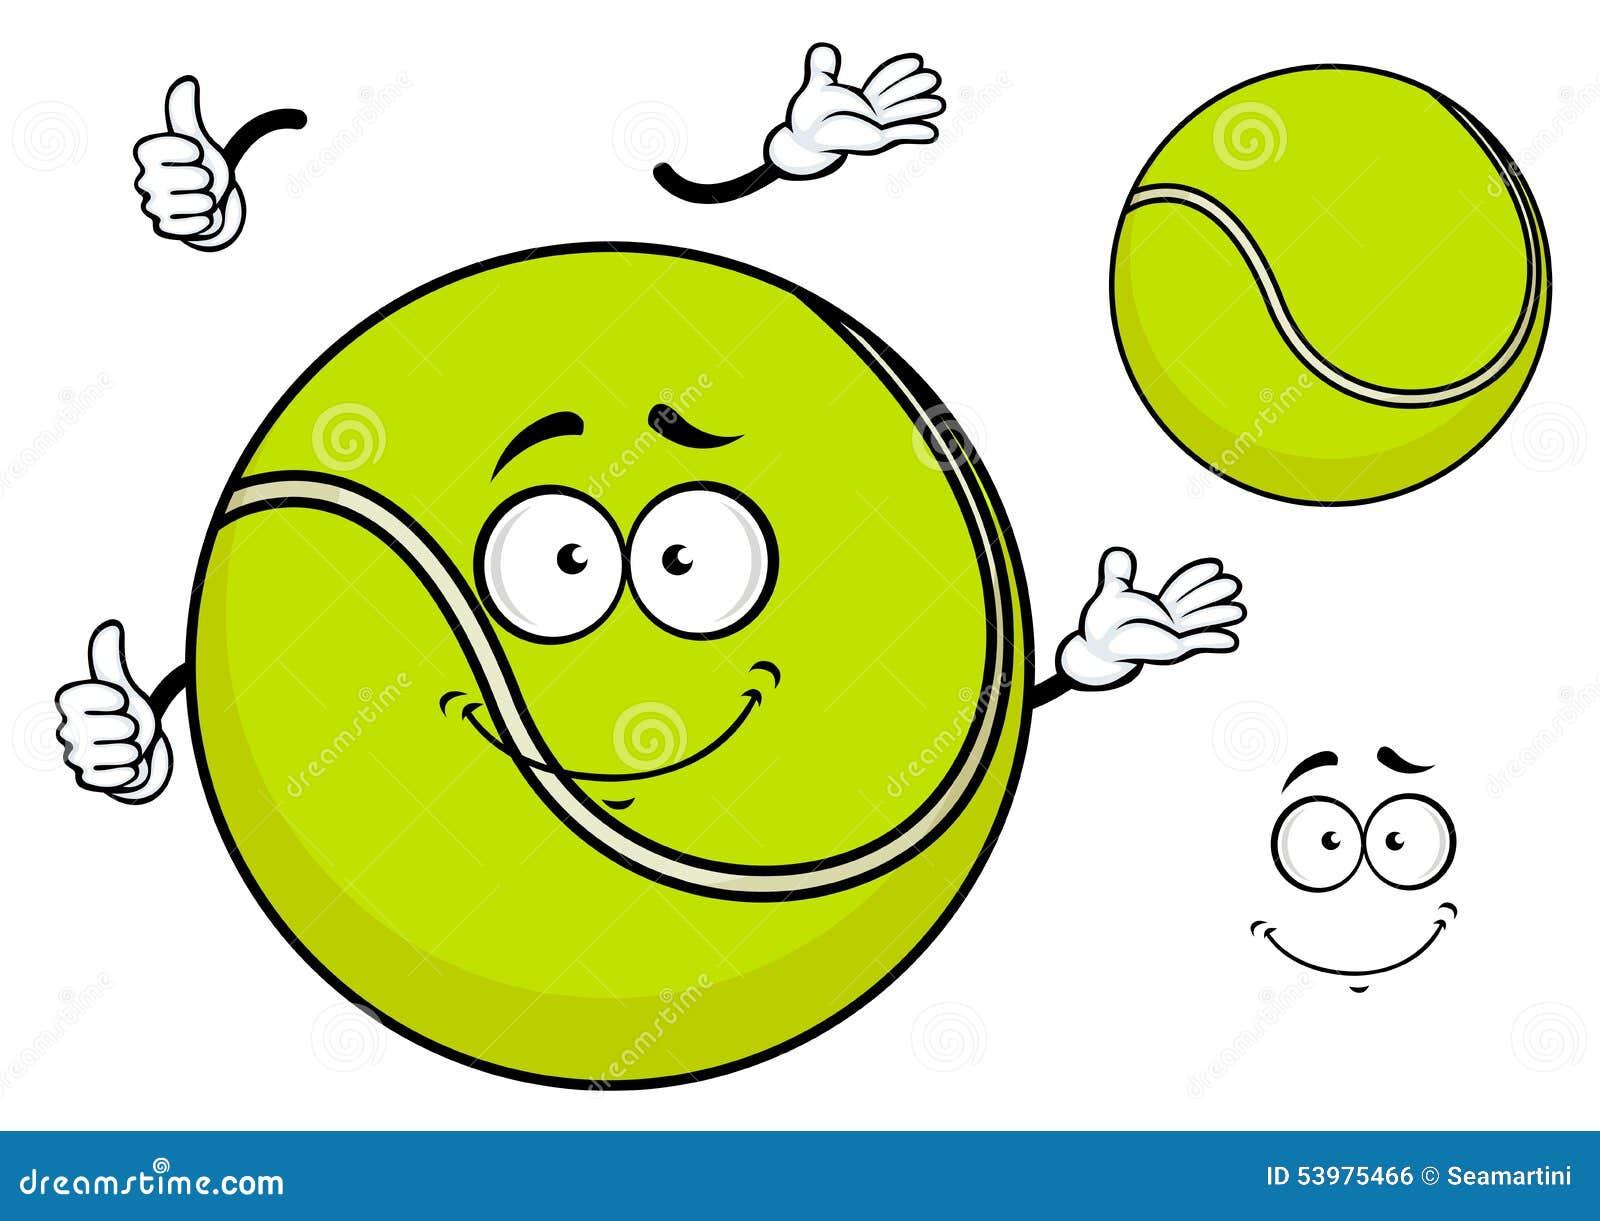 Tennis ball mascot stock photos tennis ball mascot stock photography - Smiling Green Cartoon Tennis Ball Royalty Free Stock Image